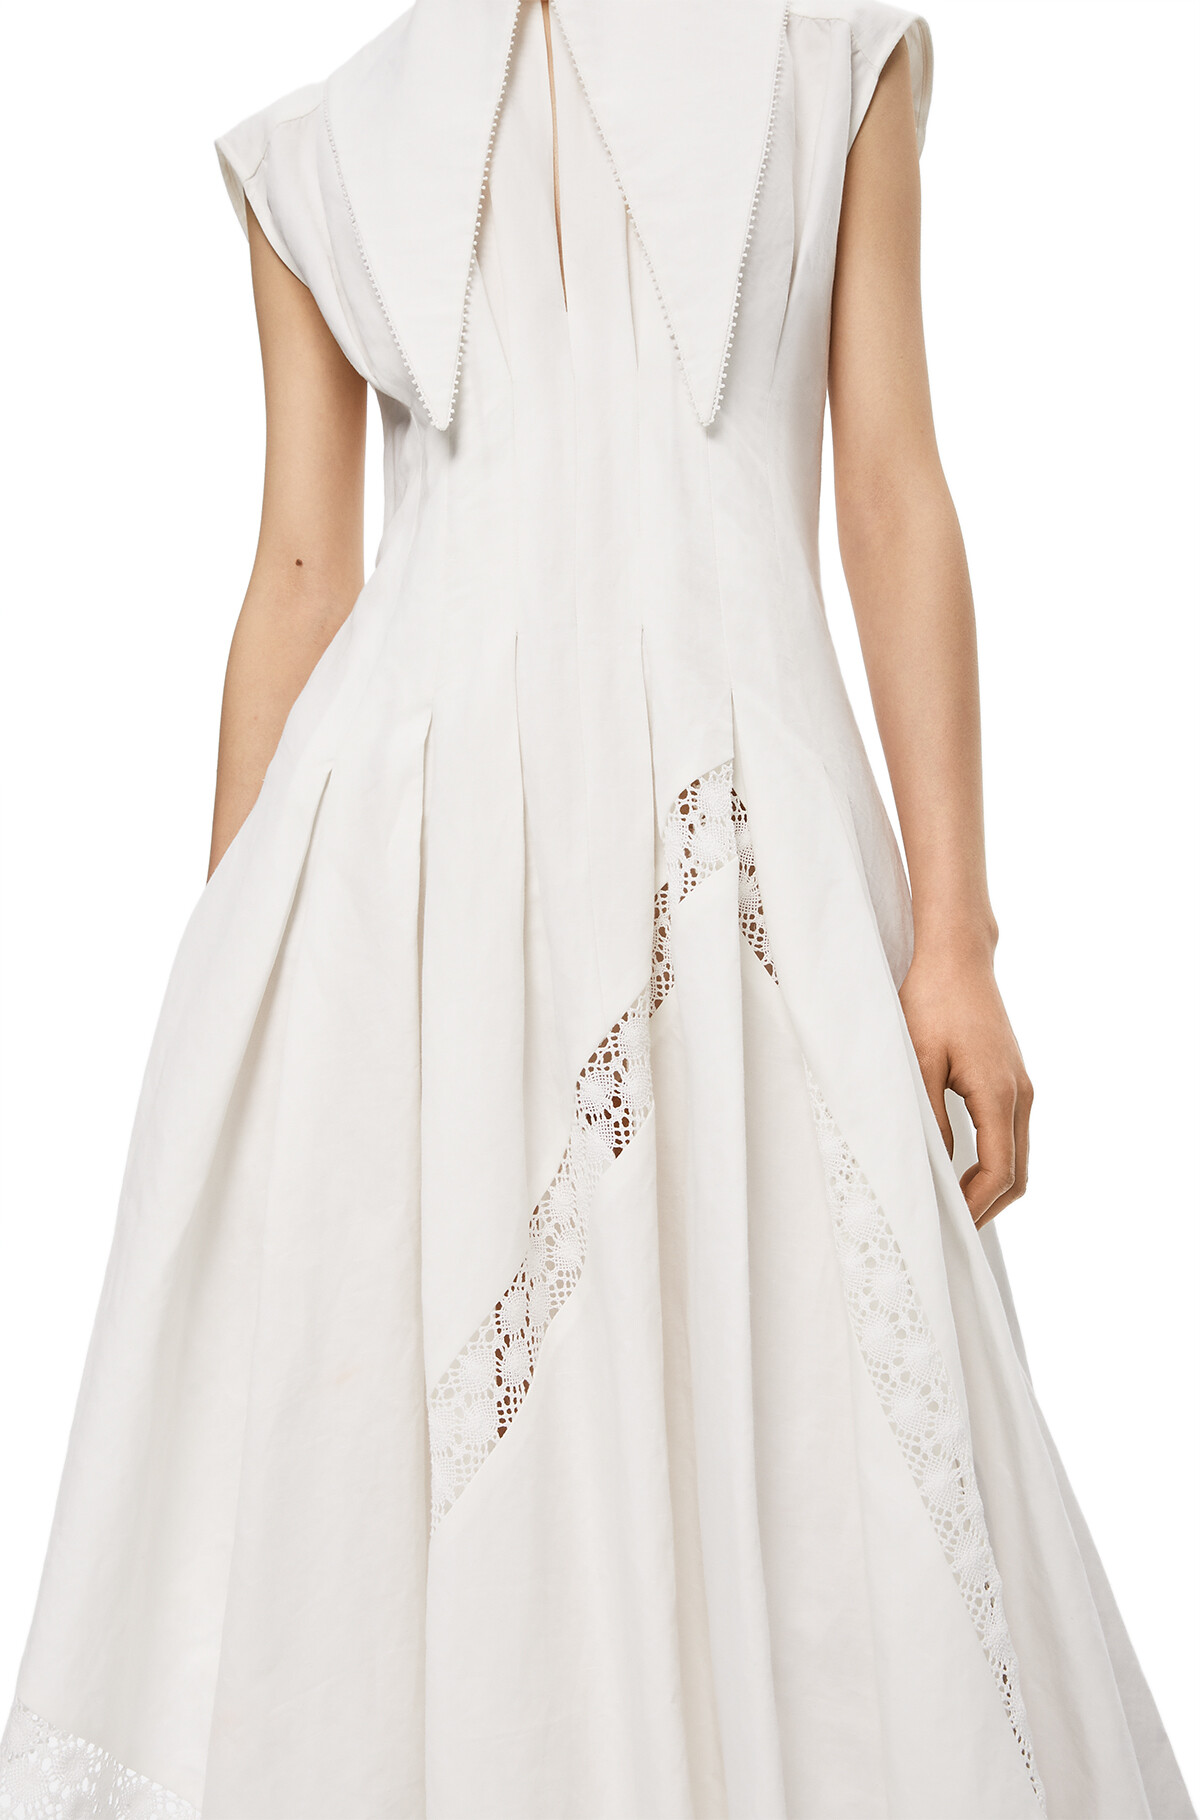 LOEWE Oversize Collar Dress White front